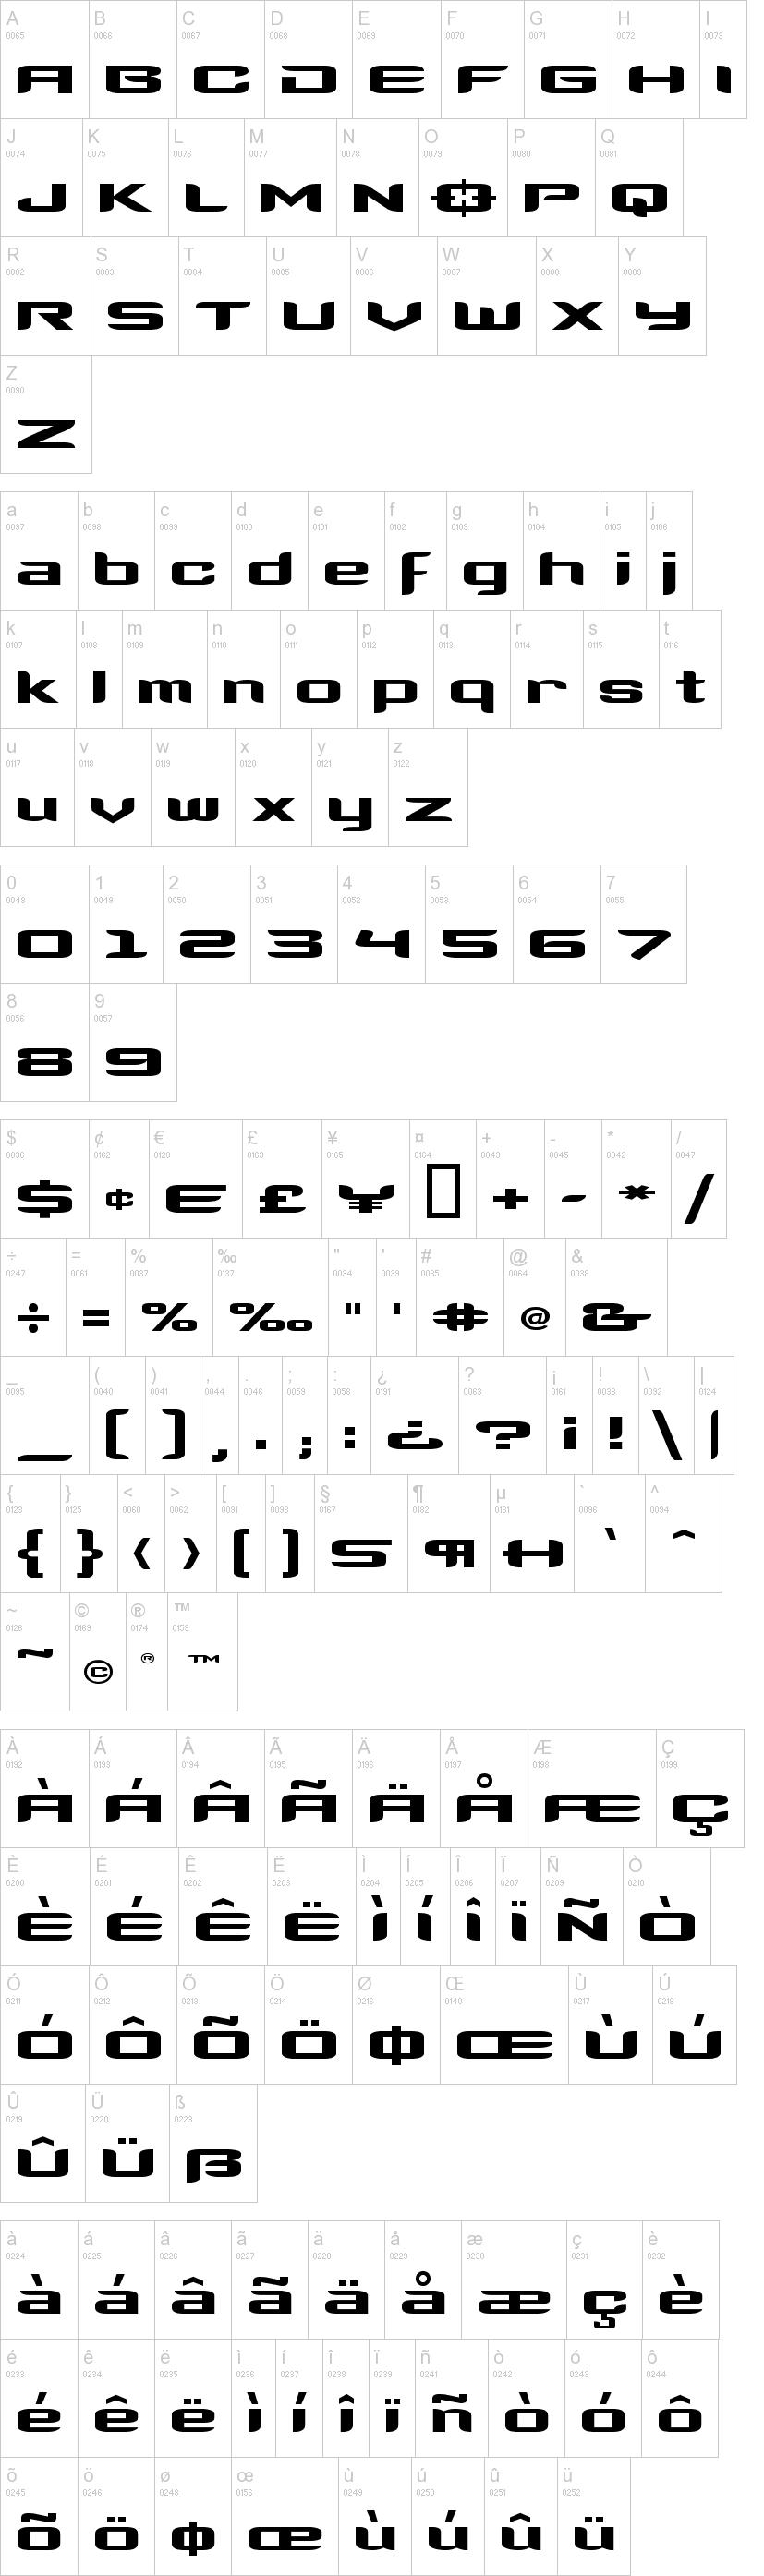 Clone Wars Font